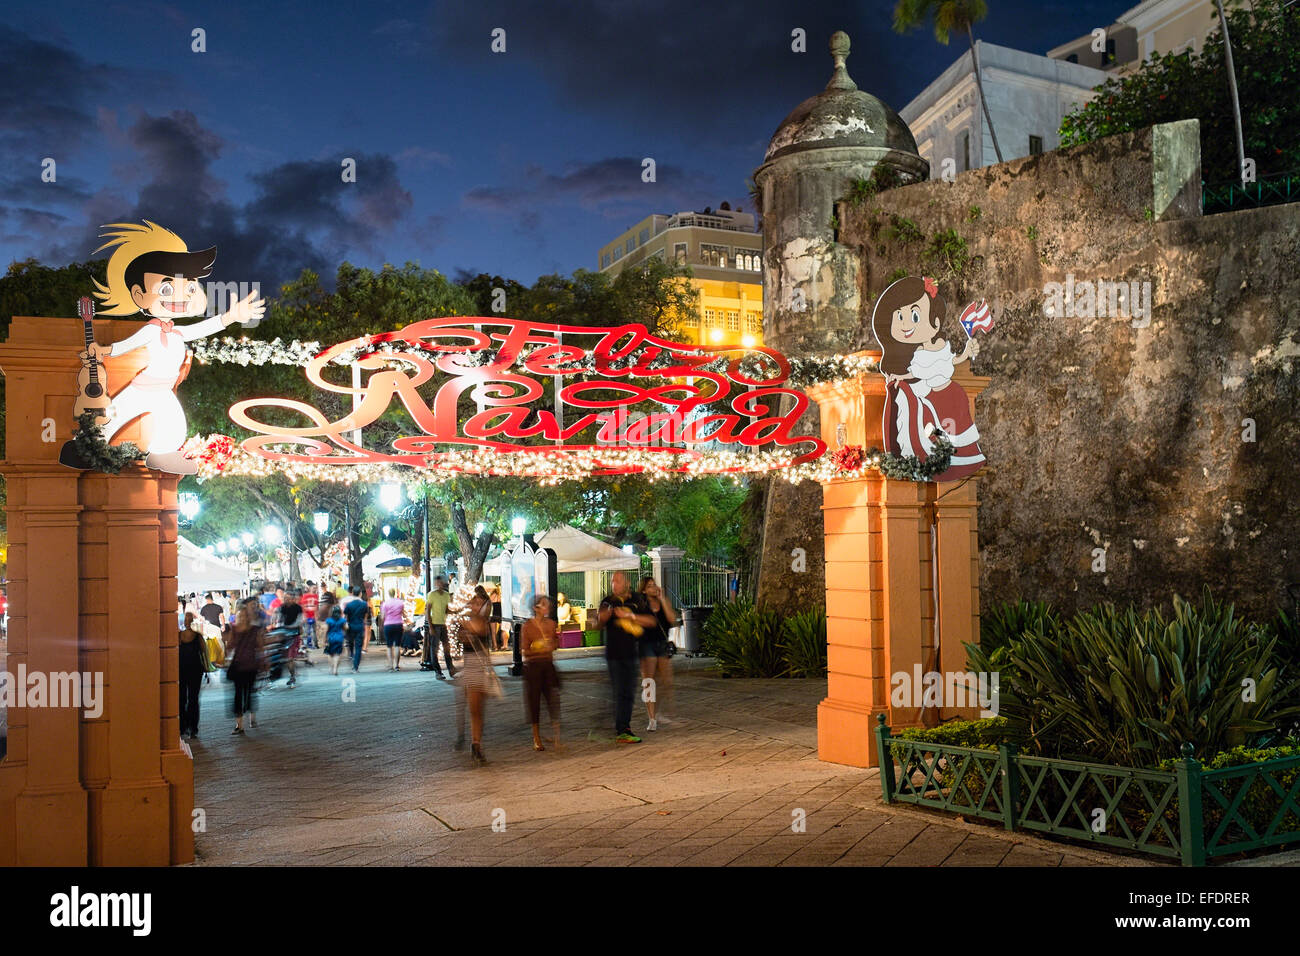 Paseo De La Princesa in Old San Juan at Night During the Christmas Holidays, Puerto Rico - Stock Image